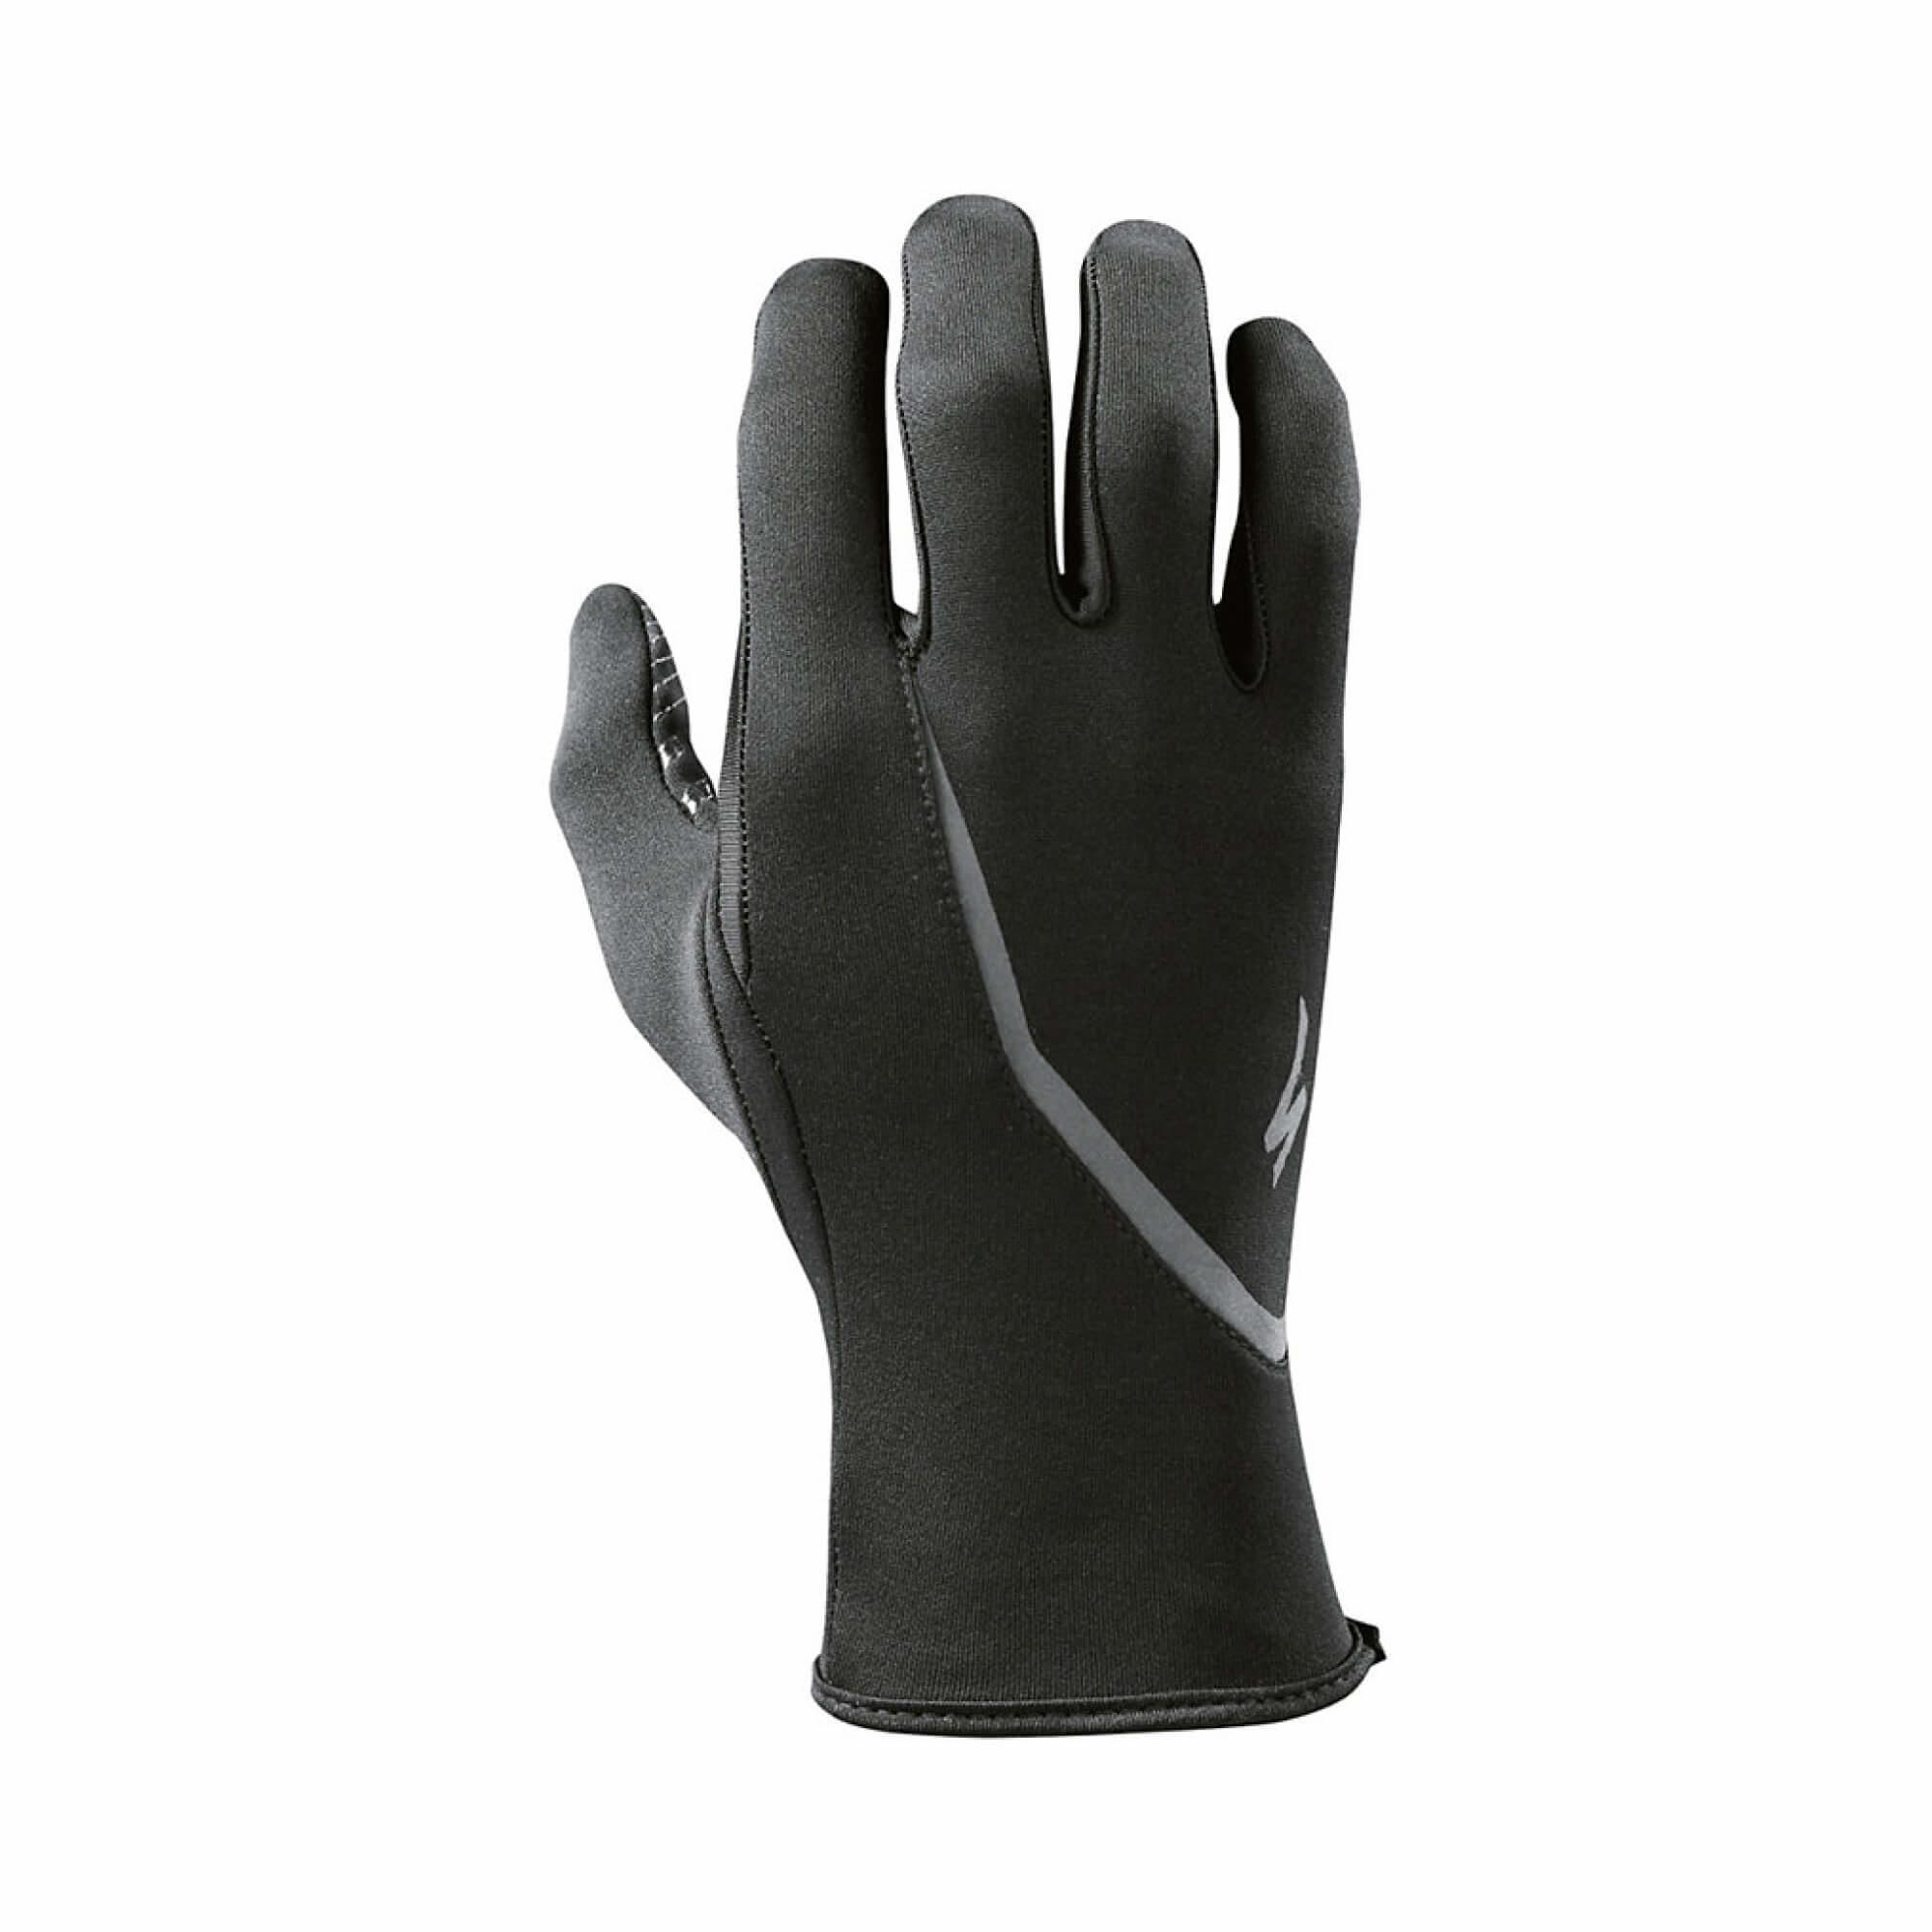 Mesta Wool Liner Glove Long Fingers-1